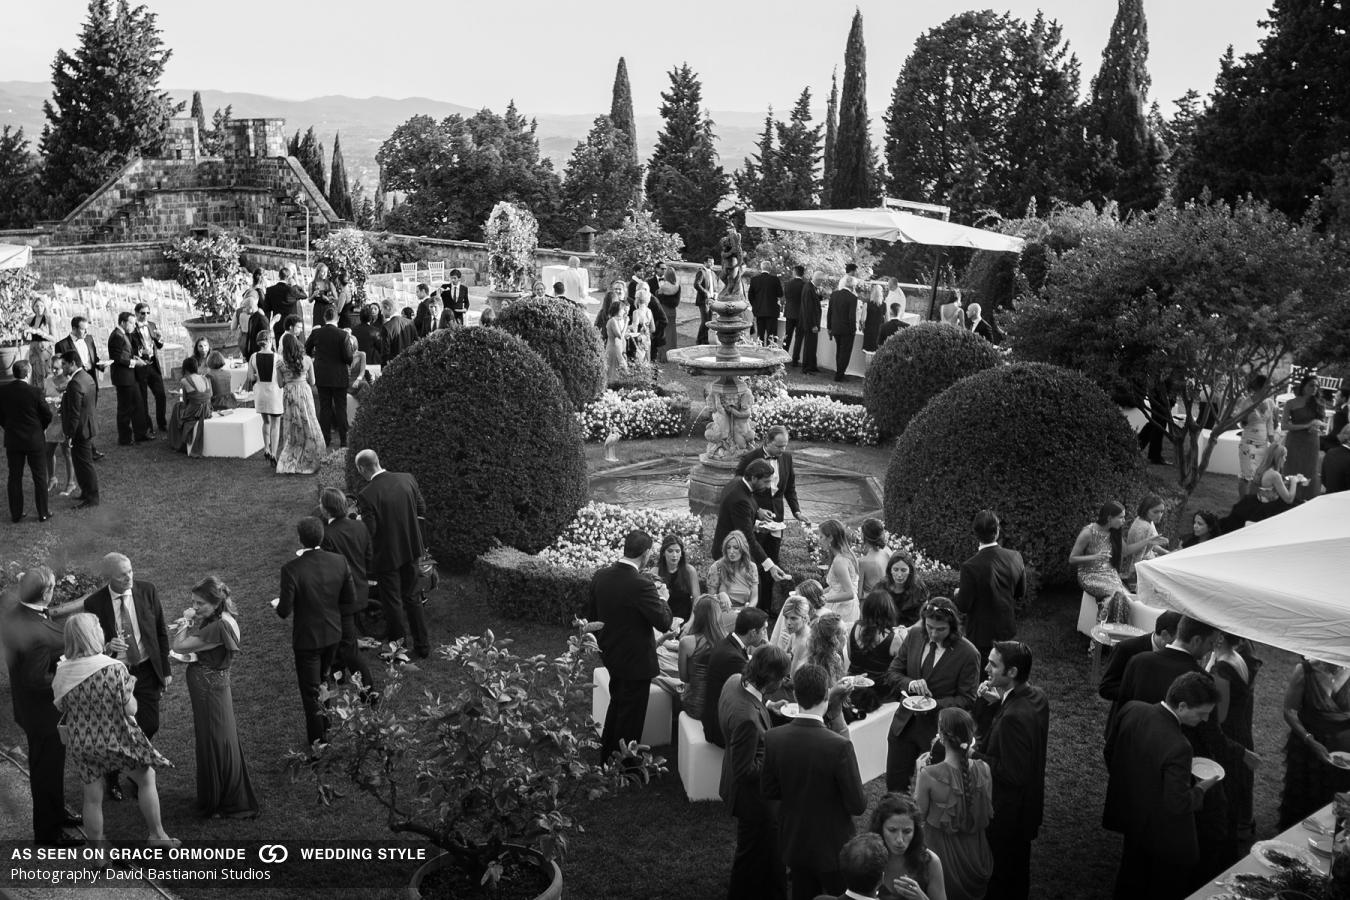 david-bastianoni-wedding-2015-08_0 :: Grace Ormonde :: Luxury wedding photography - 3 :: david-bastianoni-wedding-2015-08_0